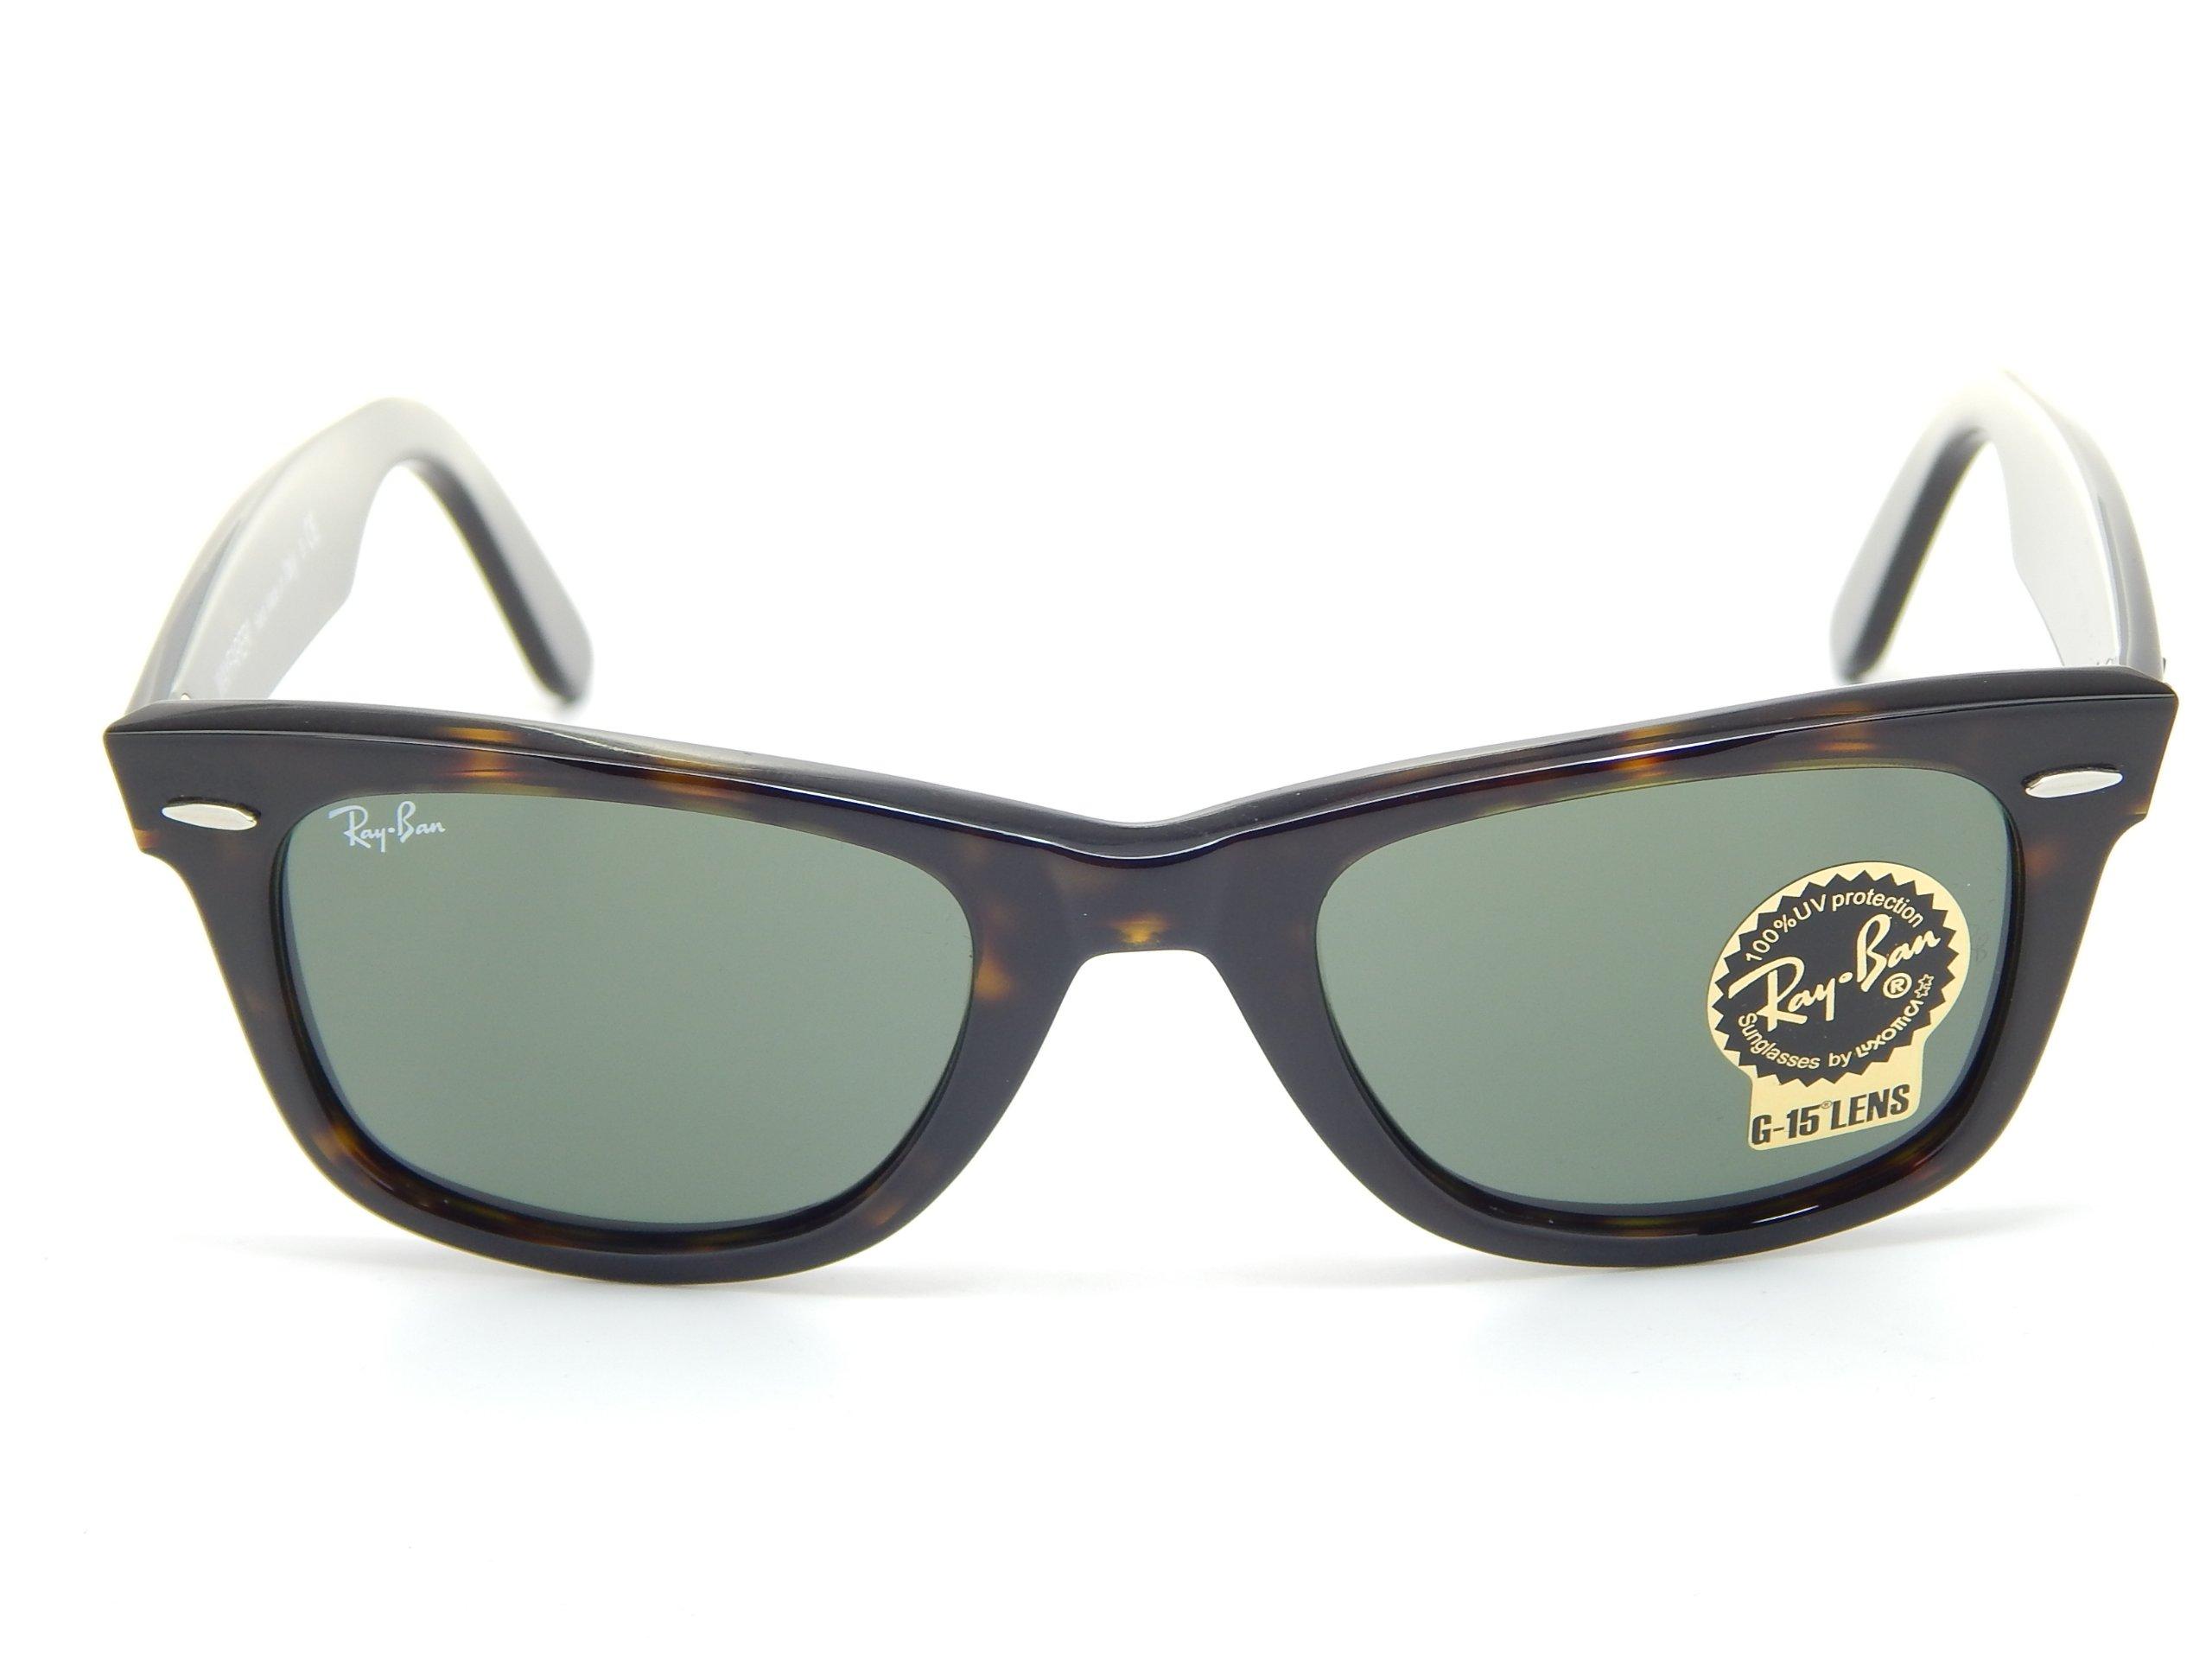 b2bb1e0bc13e8 Ray Ban Sunglasses 3310 – Southern California Weather Force